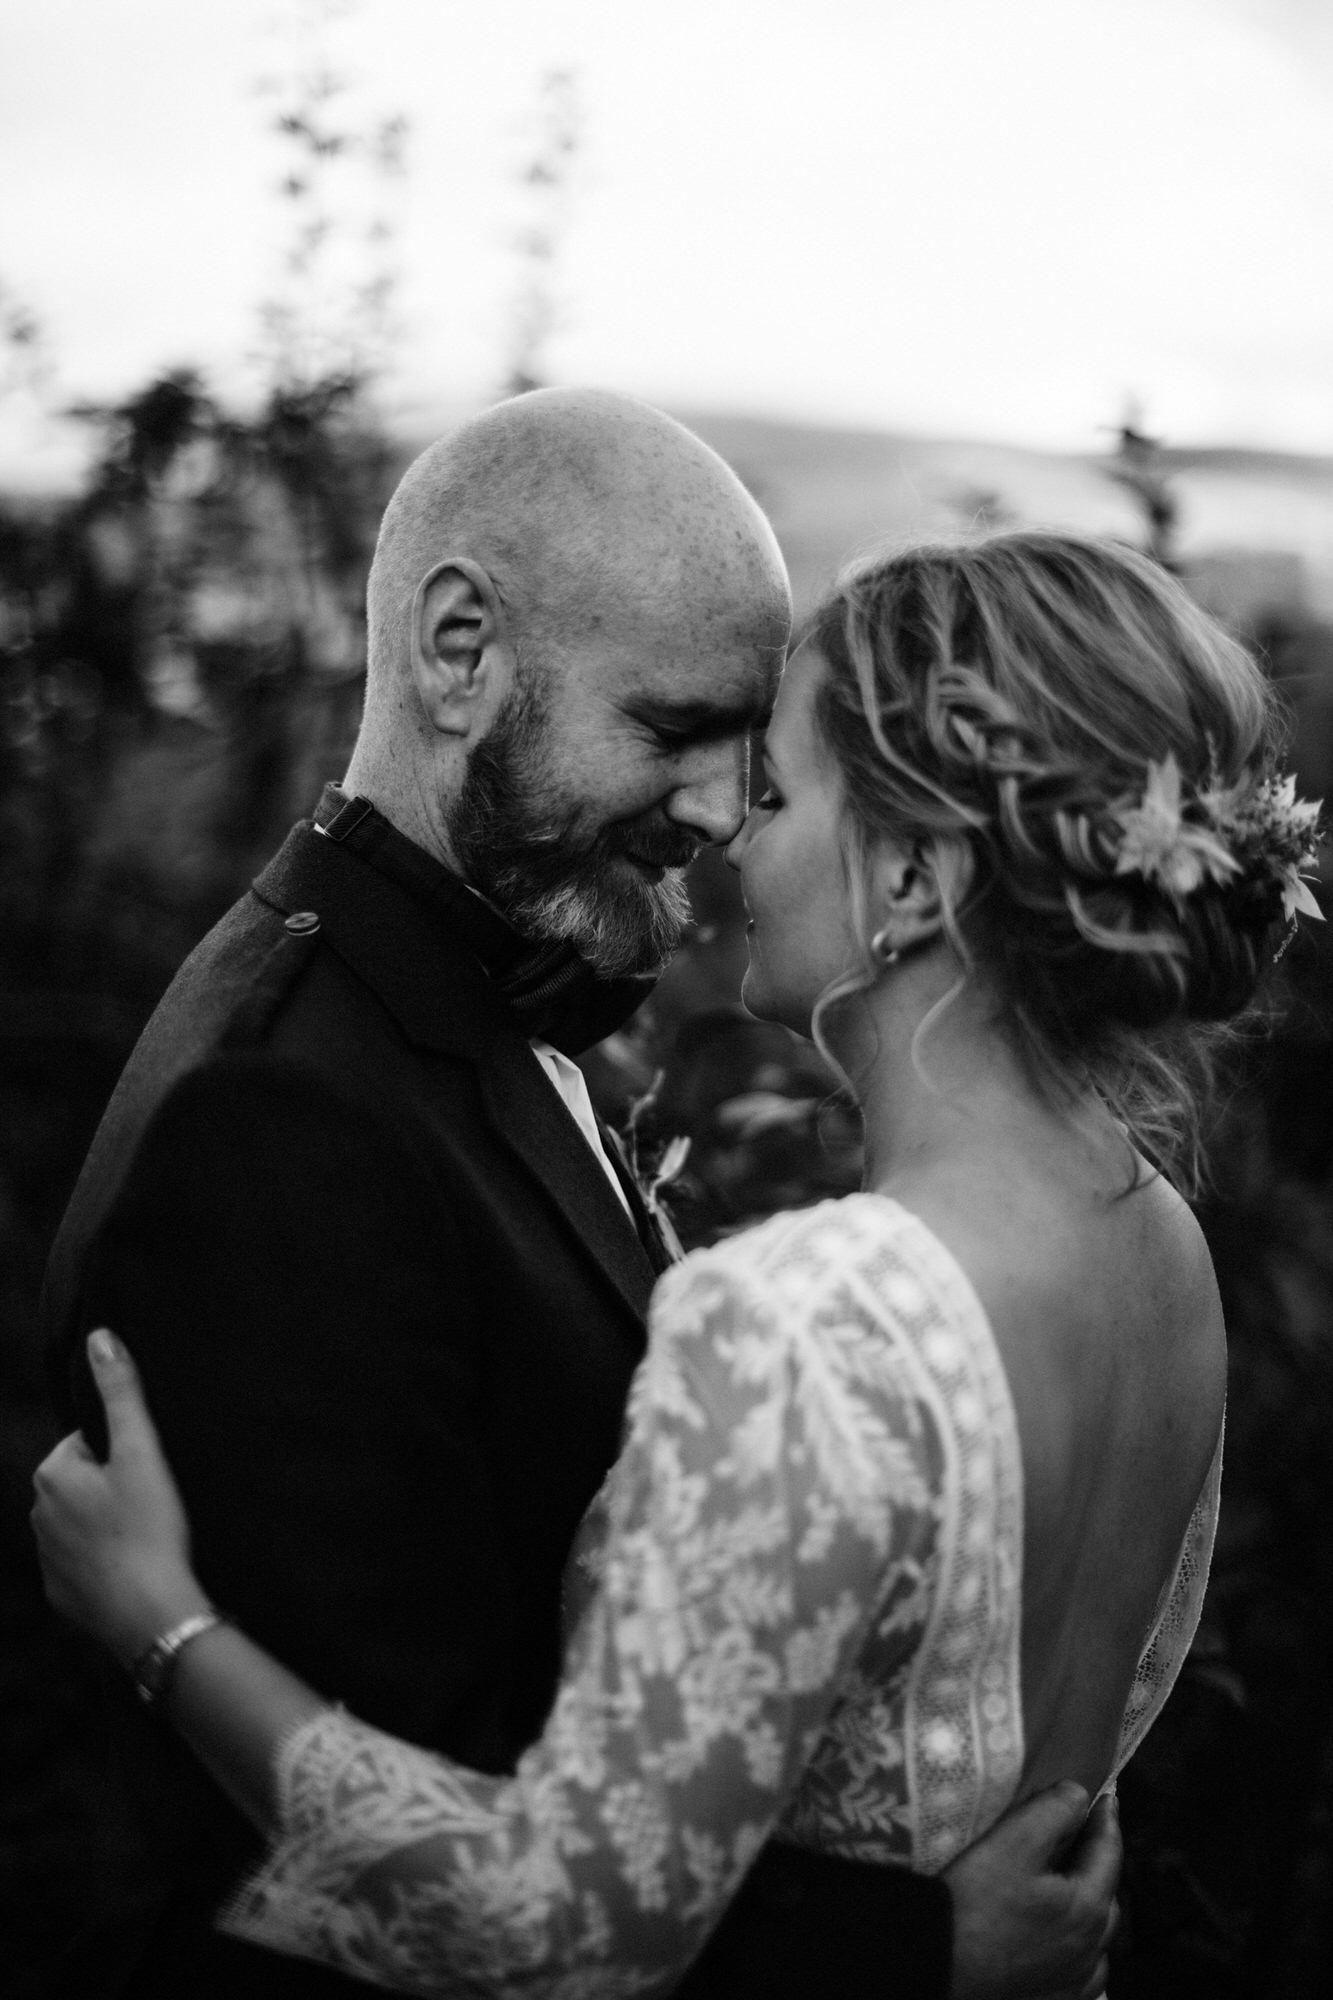 040 TIN SHED KNOCKRAICH WEDDING AUTUMN ZOE ALEXANDRA PHOTOGRAPHY